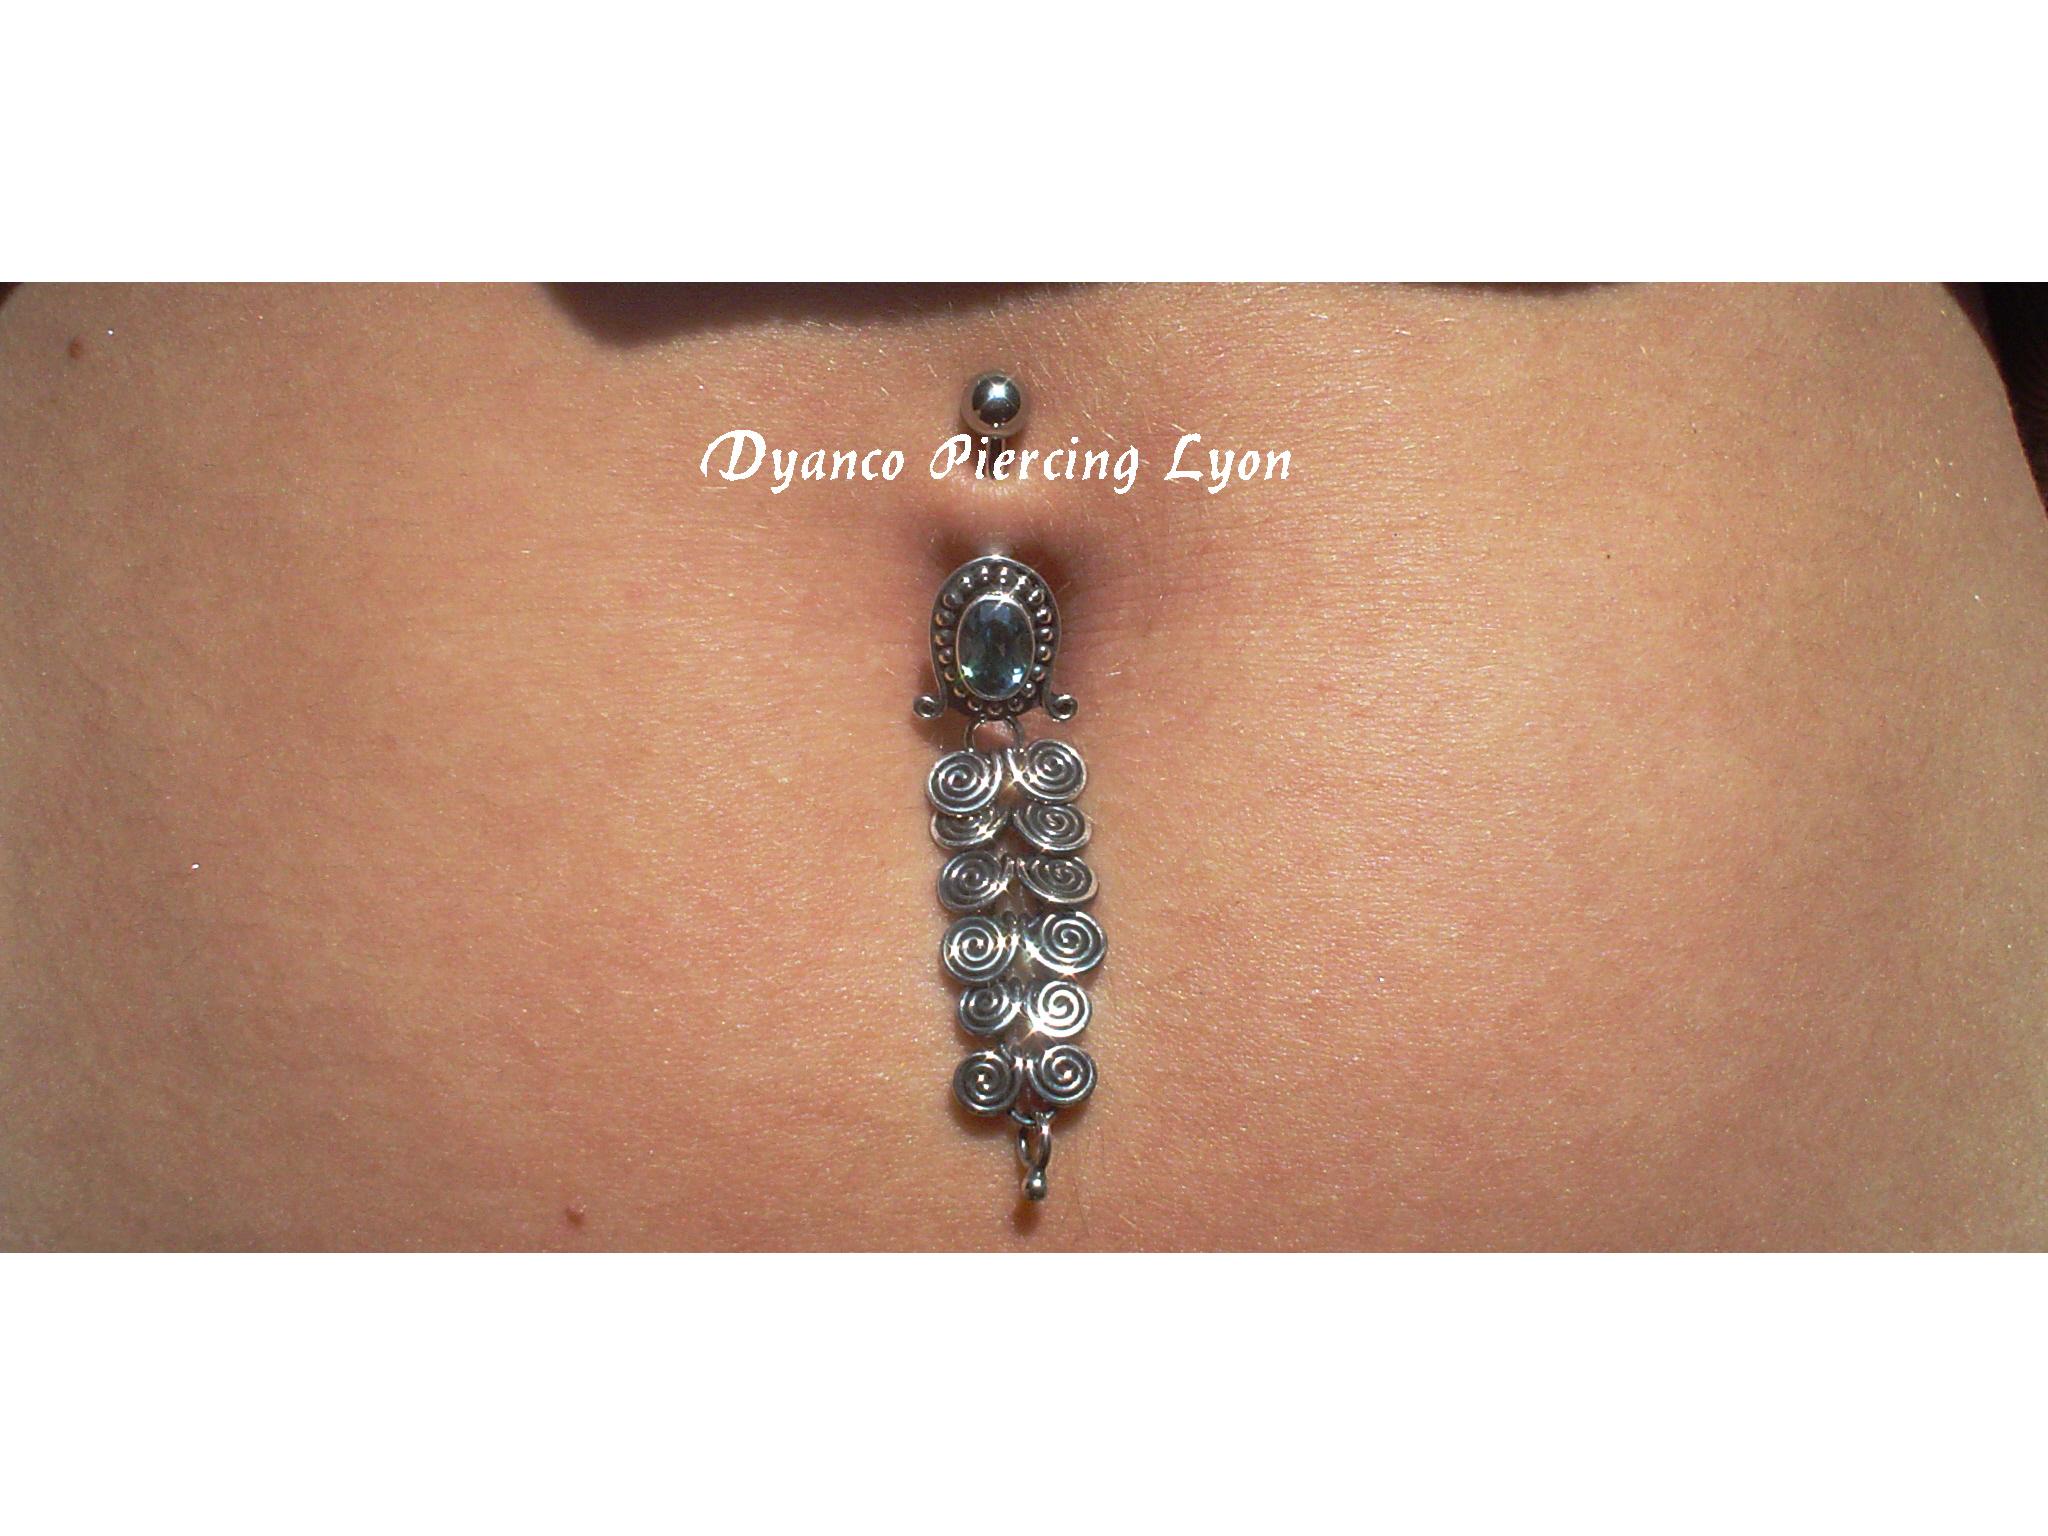 dyanco piercing lyon 61.jpg